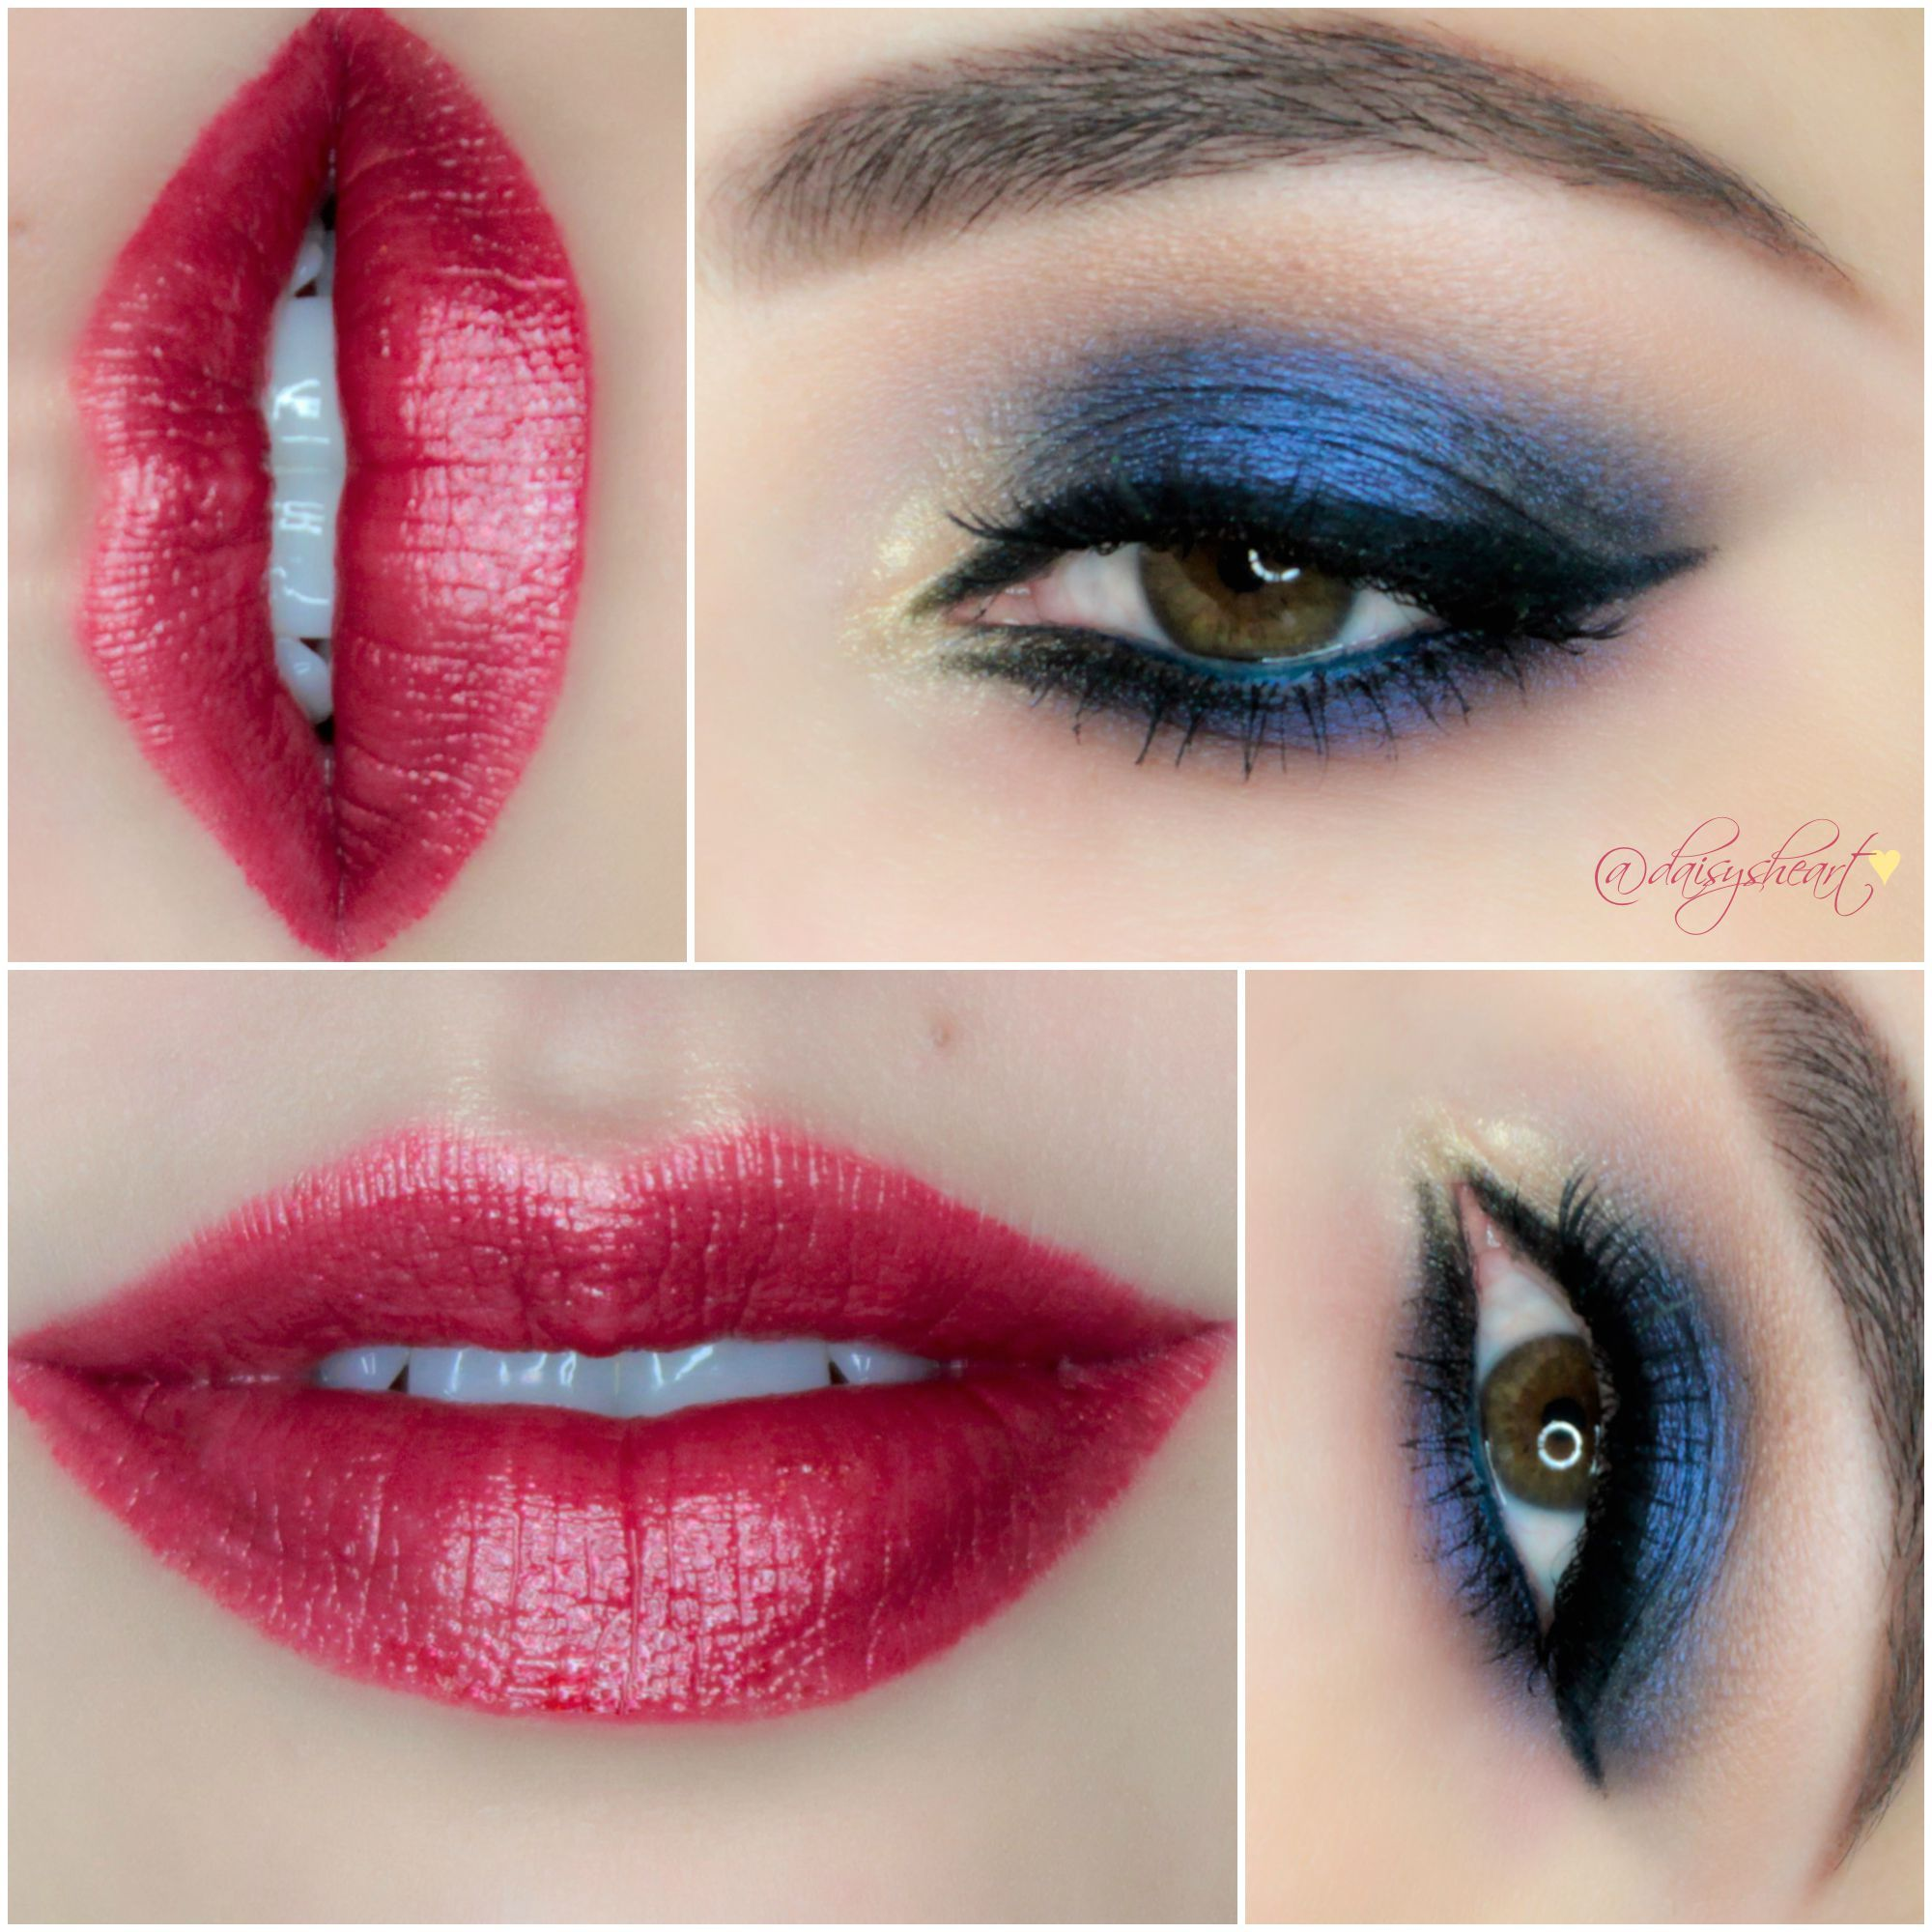 Makeup Geek shadows & Estee Lauder Pure color lipstick in ...